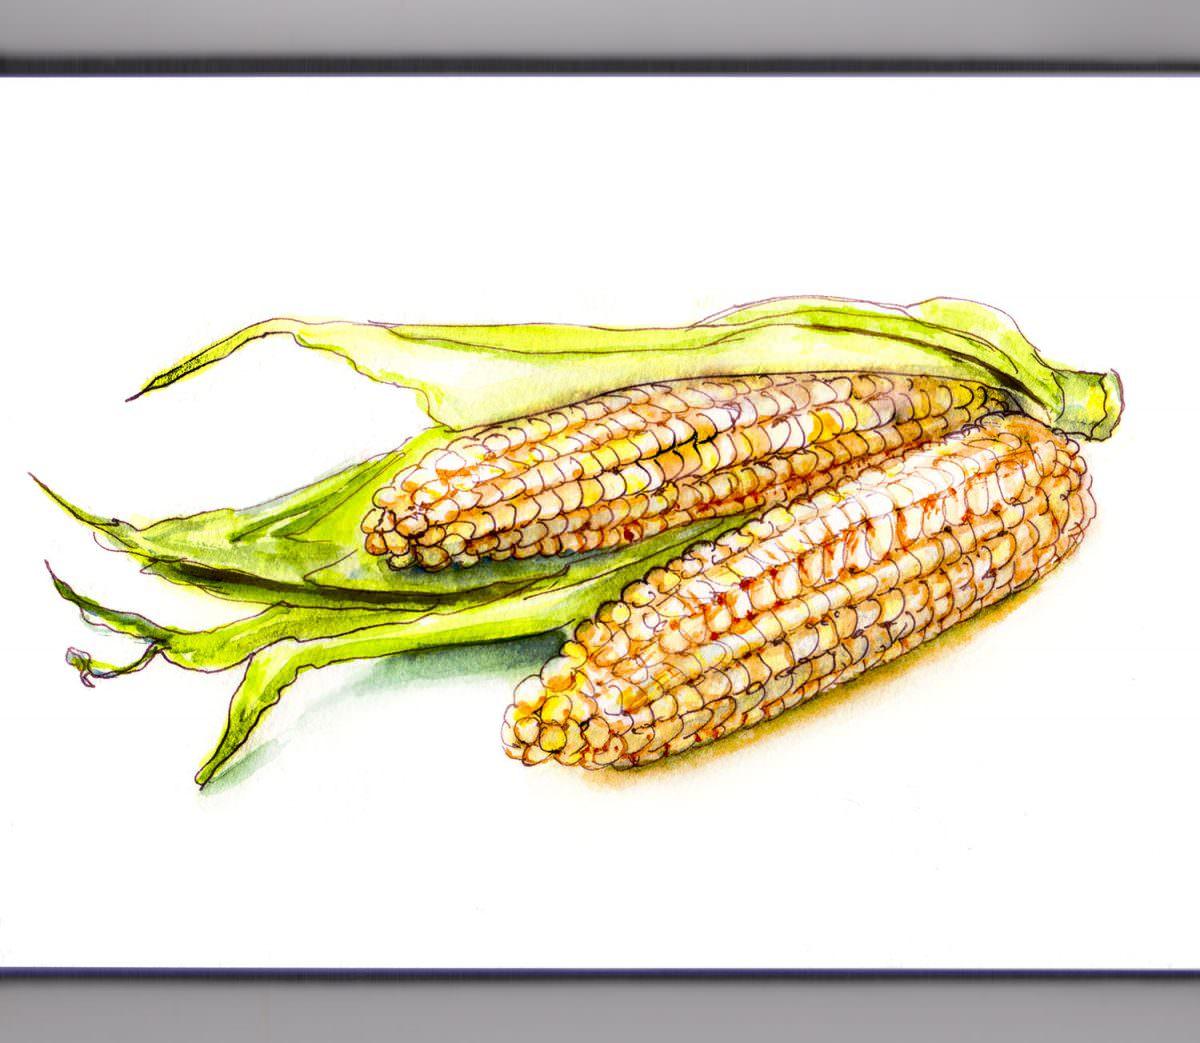 #WorldWatercolorGroup - A Bit Of Corn - #doodlewash